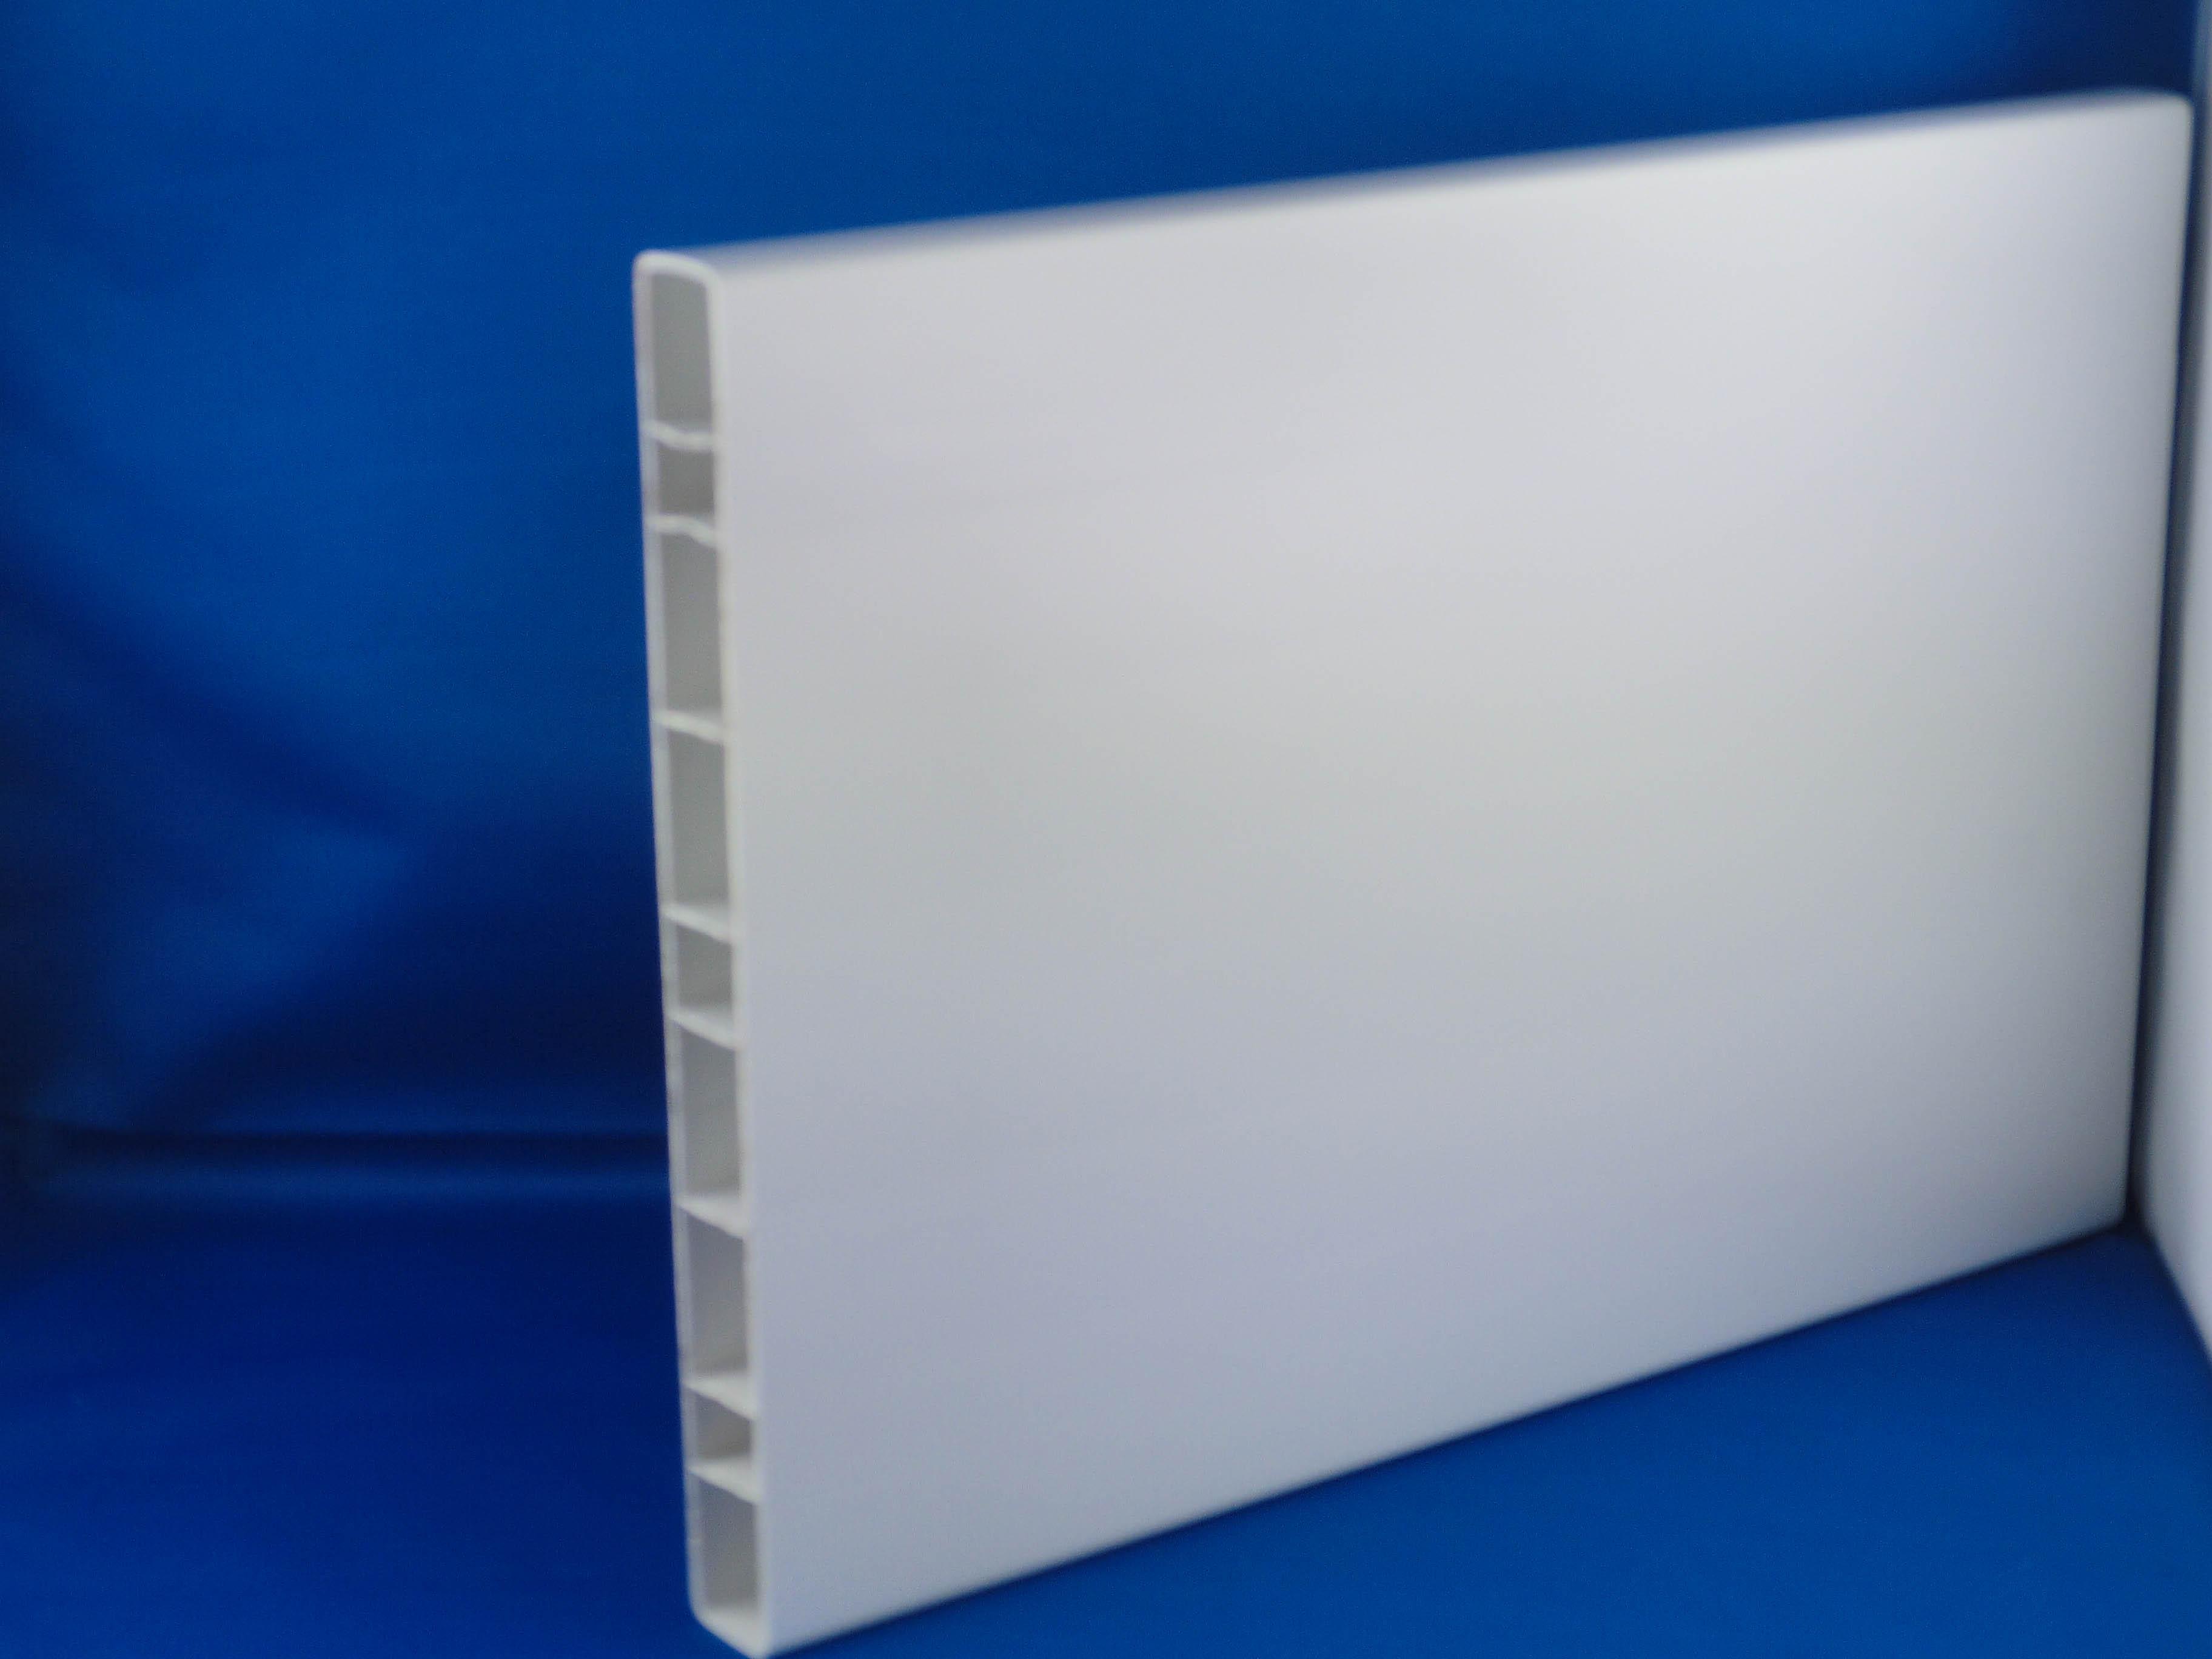 pvc balkonbrett wei 200 x 20 mm balkonbretter. Black Bedroom Furniture Sets. Home Design Ideas